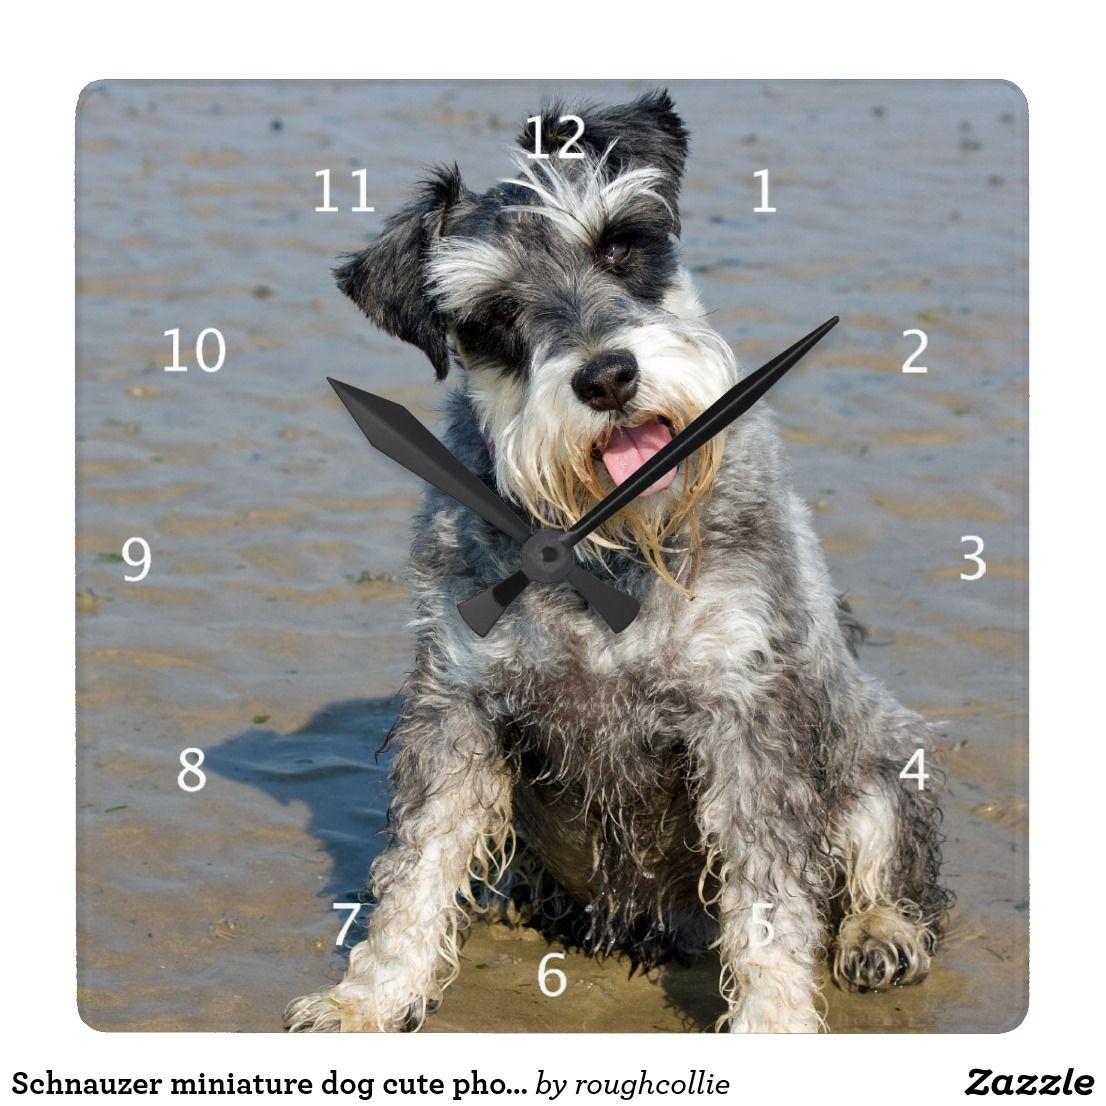 Schnauzer Miniature Dog Cute Photo At Beach Gift Square Wall Clock Zazzle Ca Miniature Dogs Dog Photos Dogs